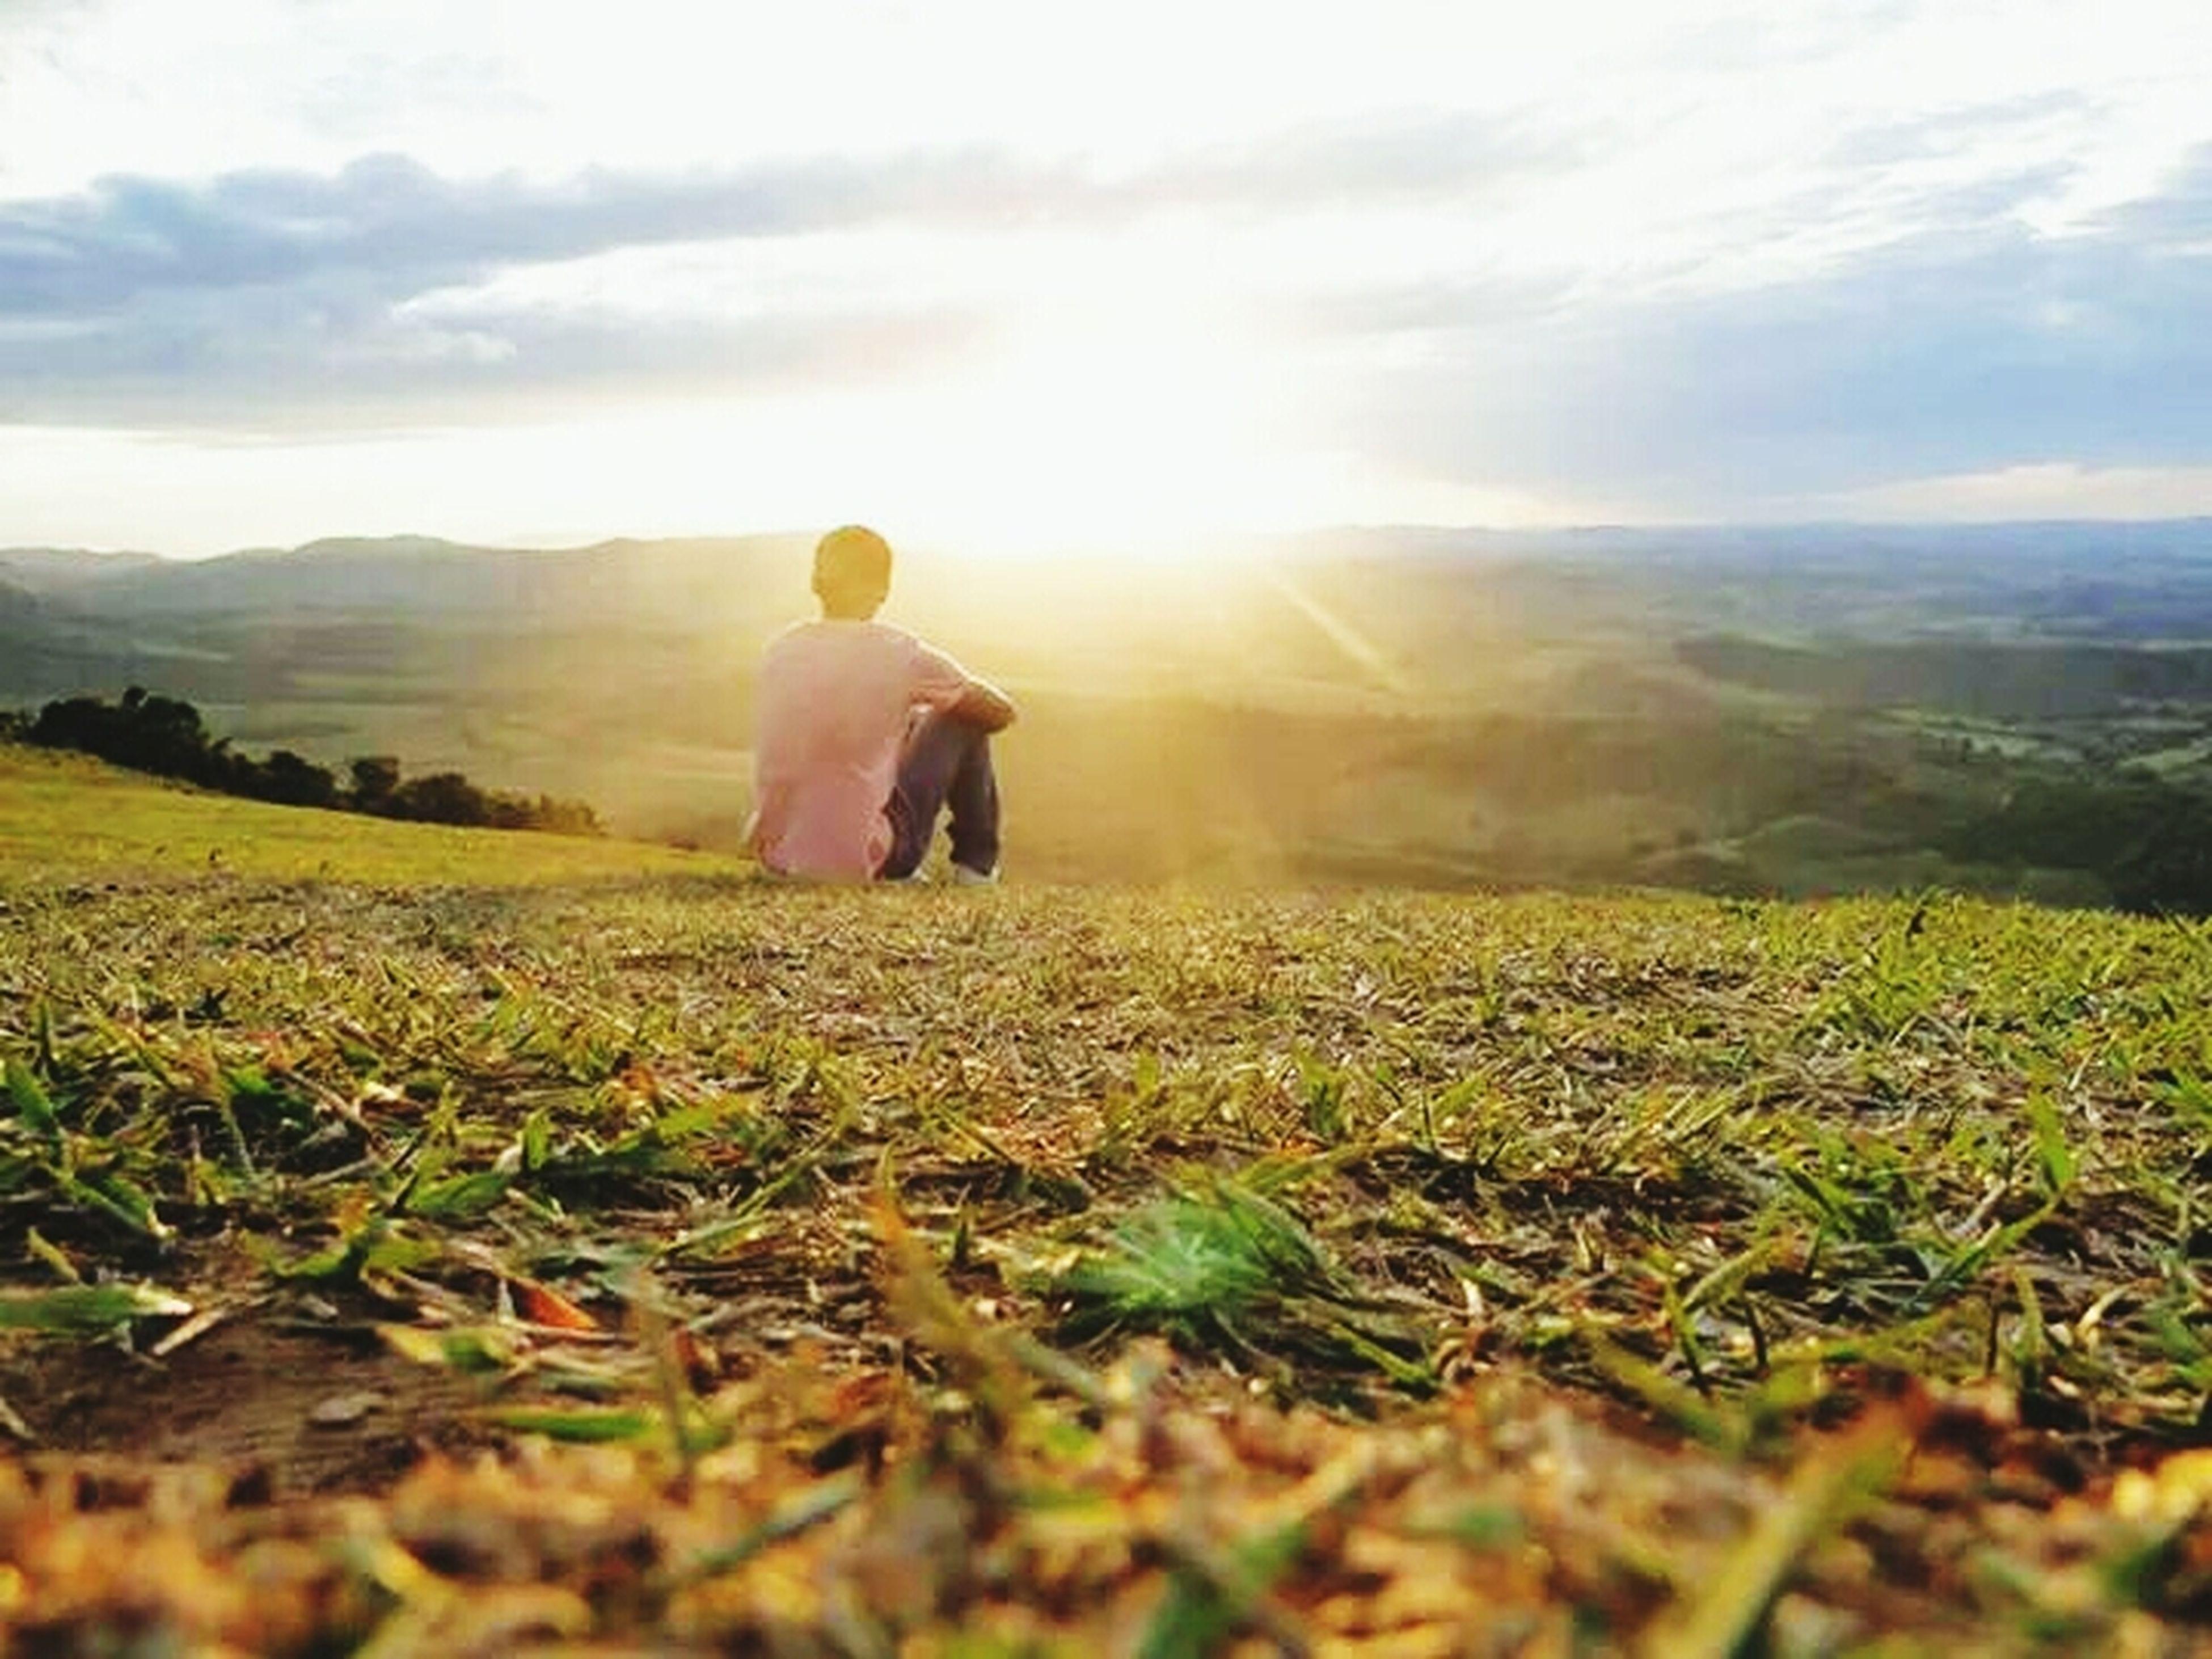 landscape, field, sun, sunbeam, grass, sky, sunlight, nature, lens flare, tranquil scene, beauty in nature, leisure activity, men, tranquility, scenics, lifestyles, mountain, rural scene, rear view